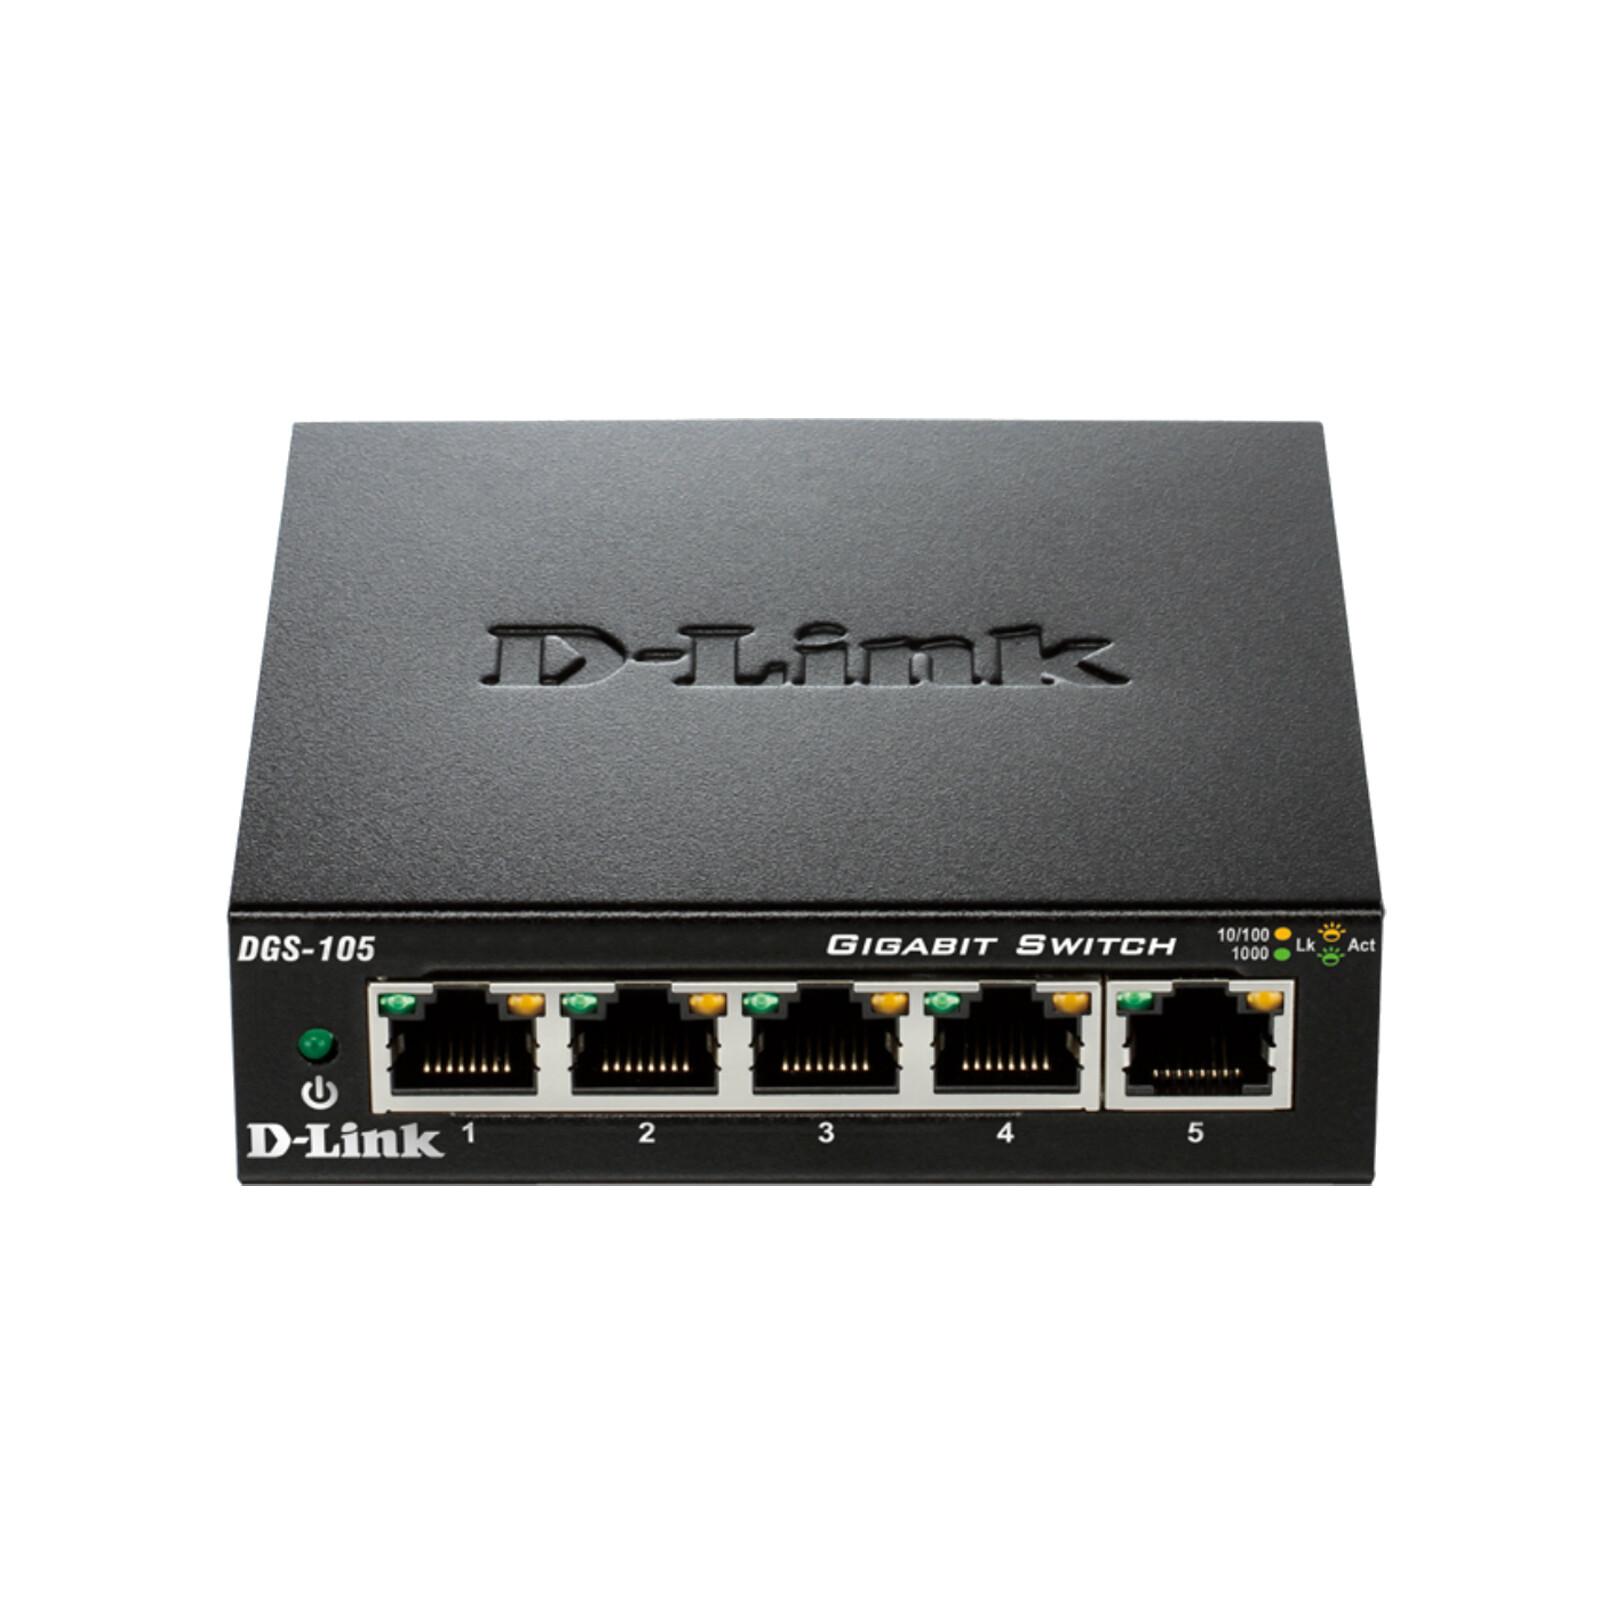 D-Link 5-Port Layer2 Gigabit Switch